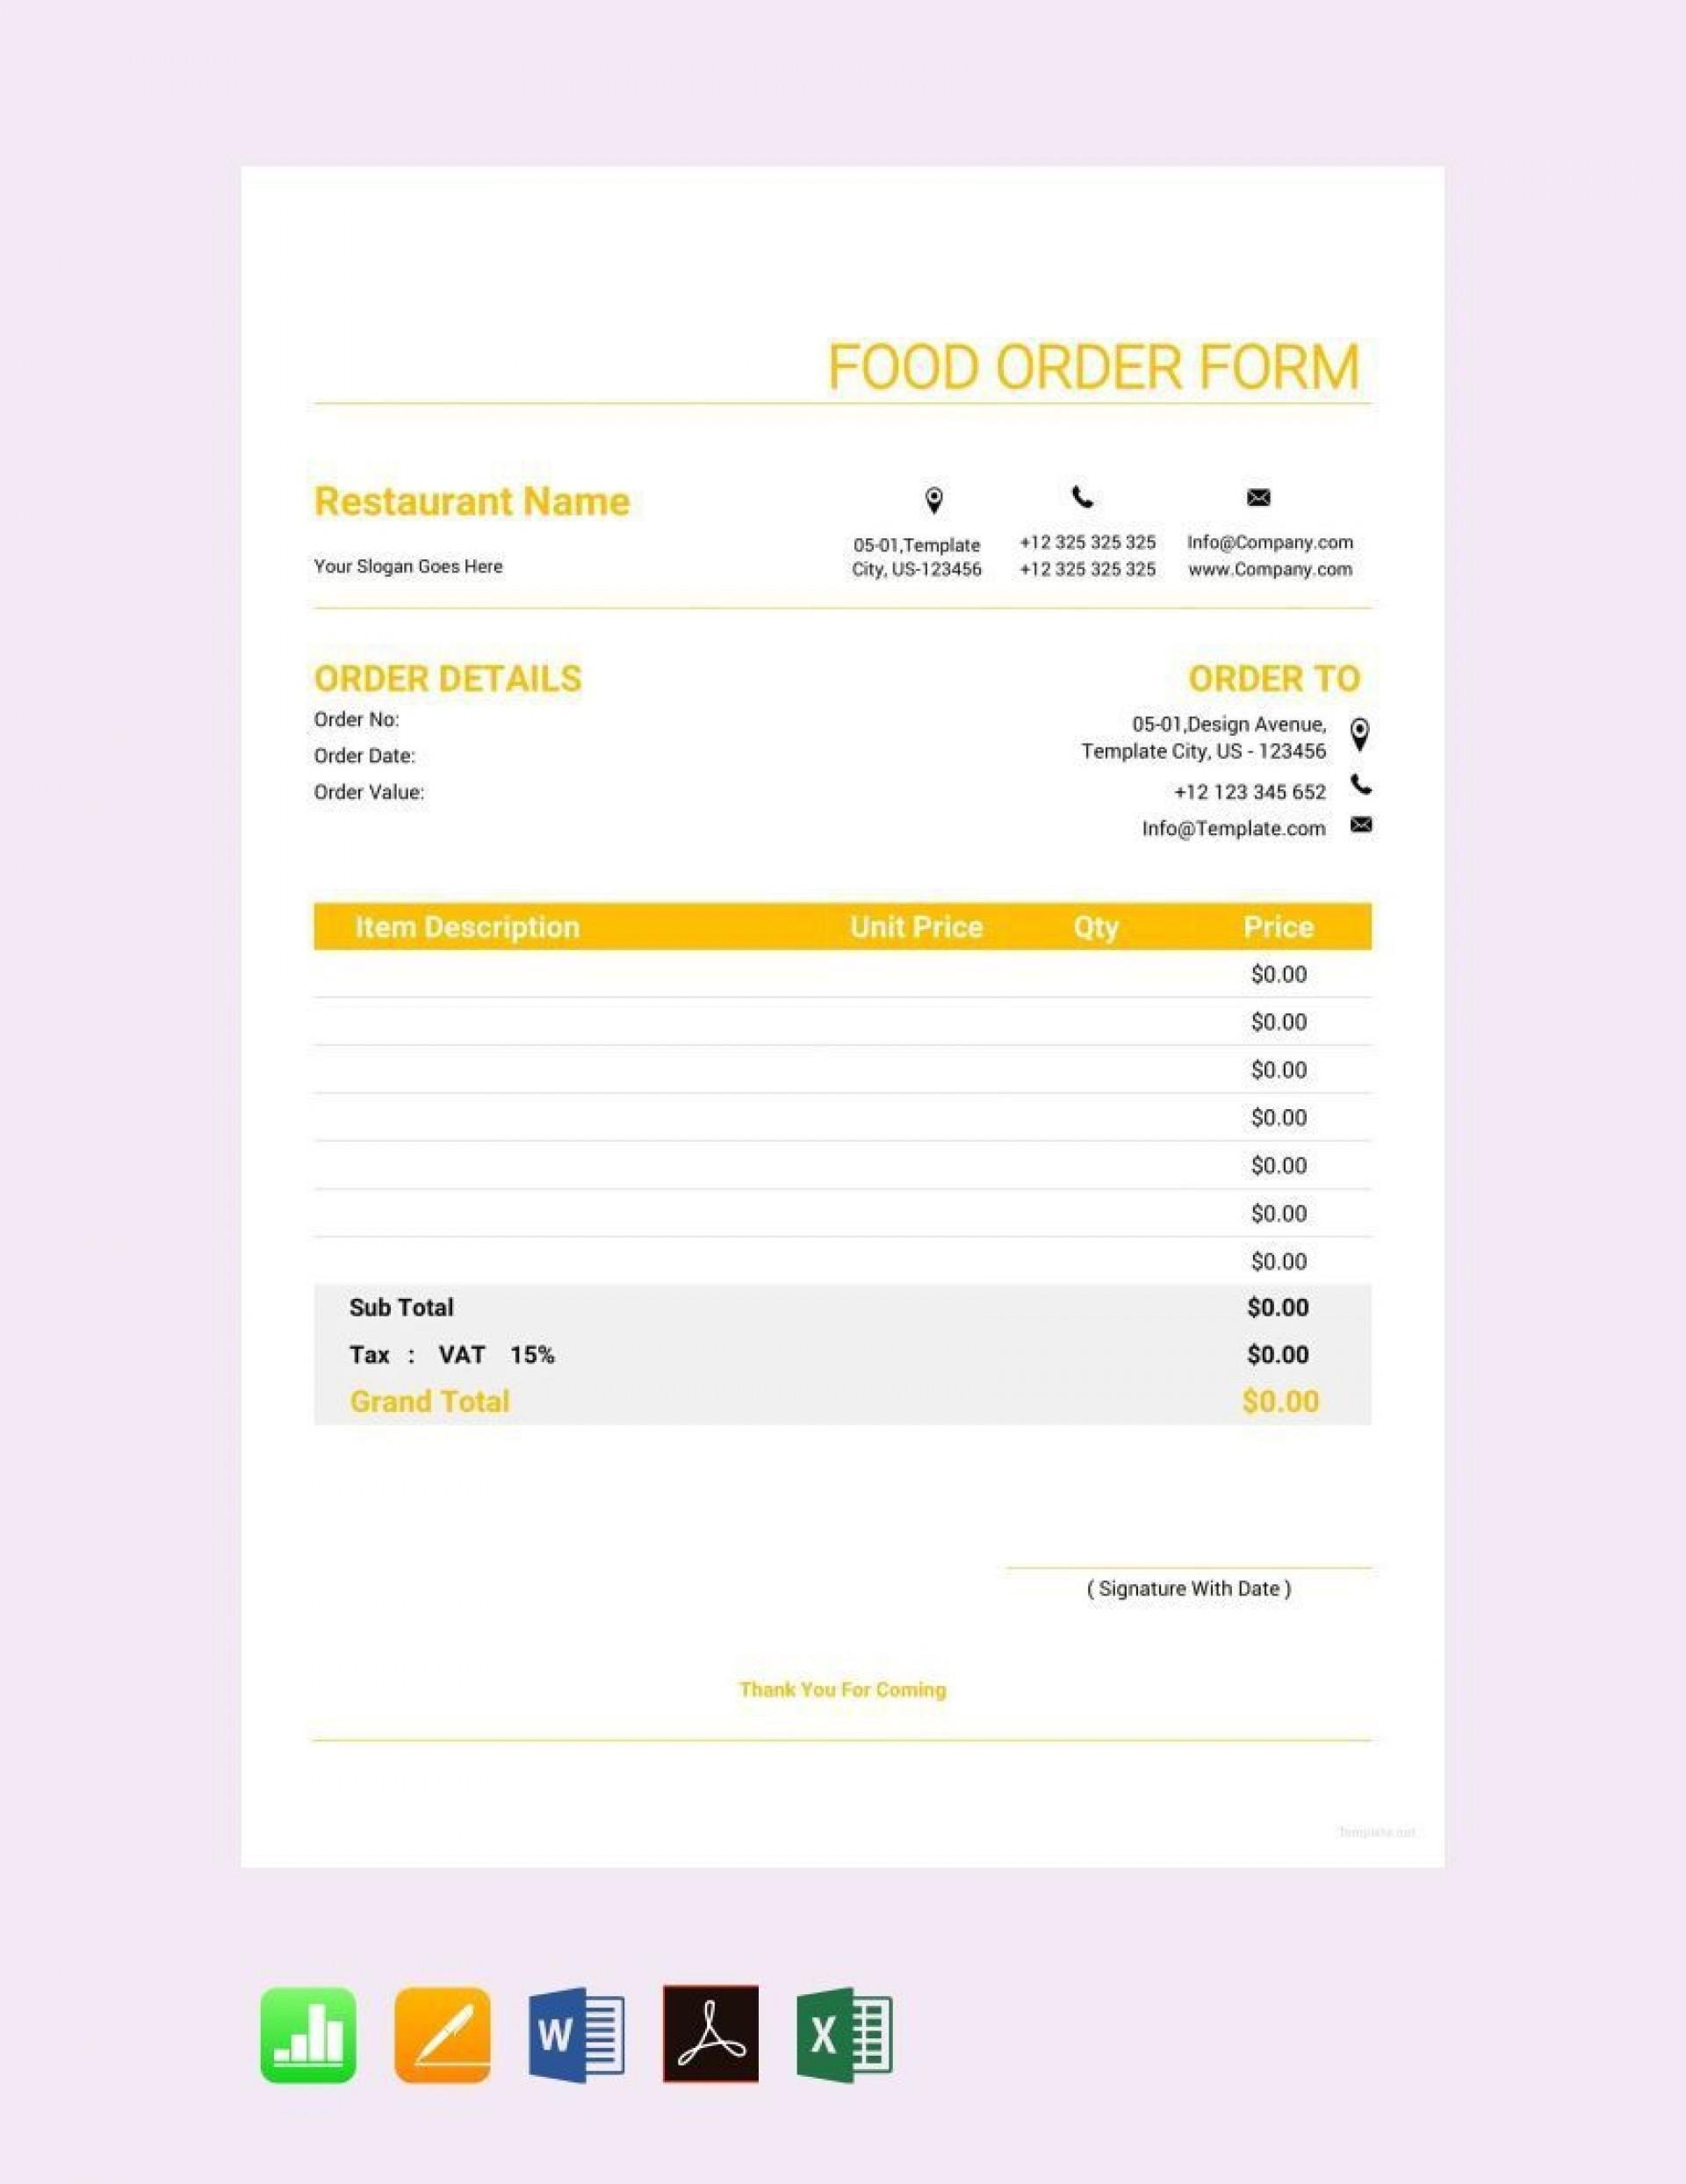 005 Excellent Food Order Form Template Word Design 1920